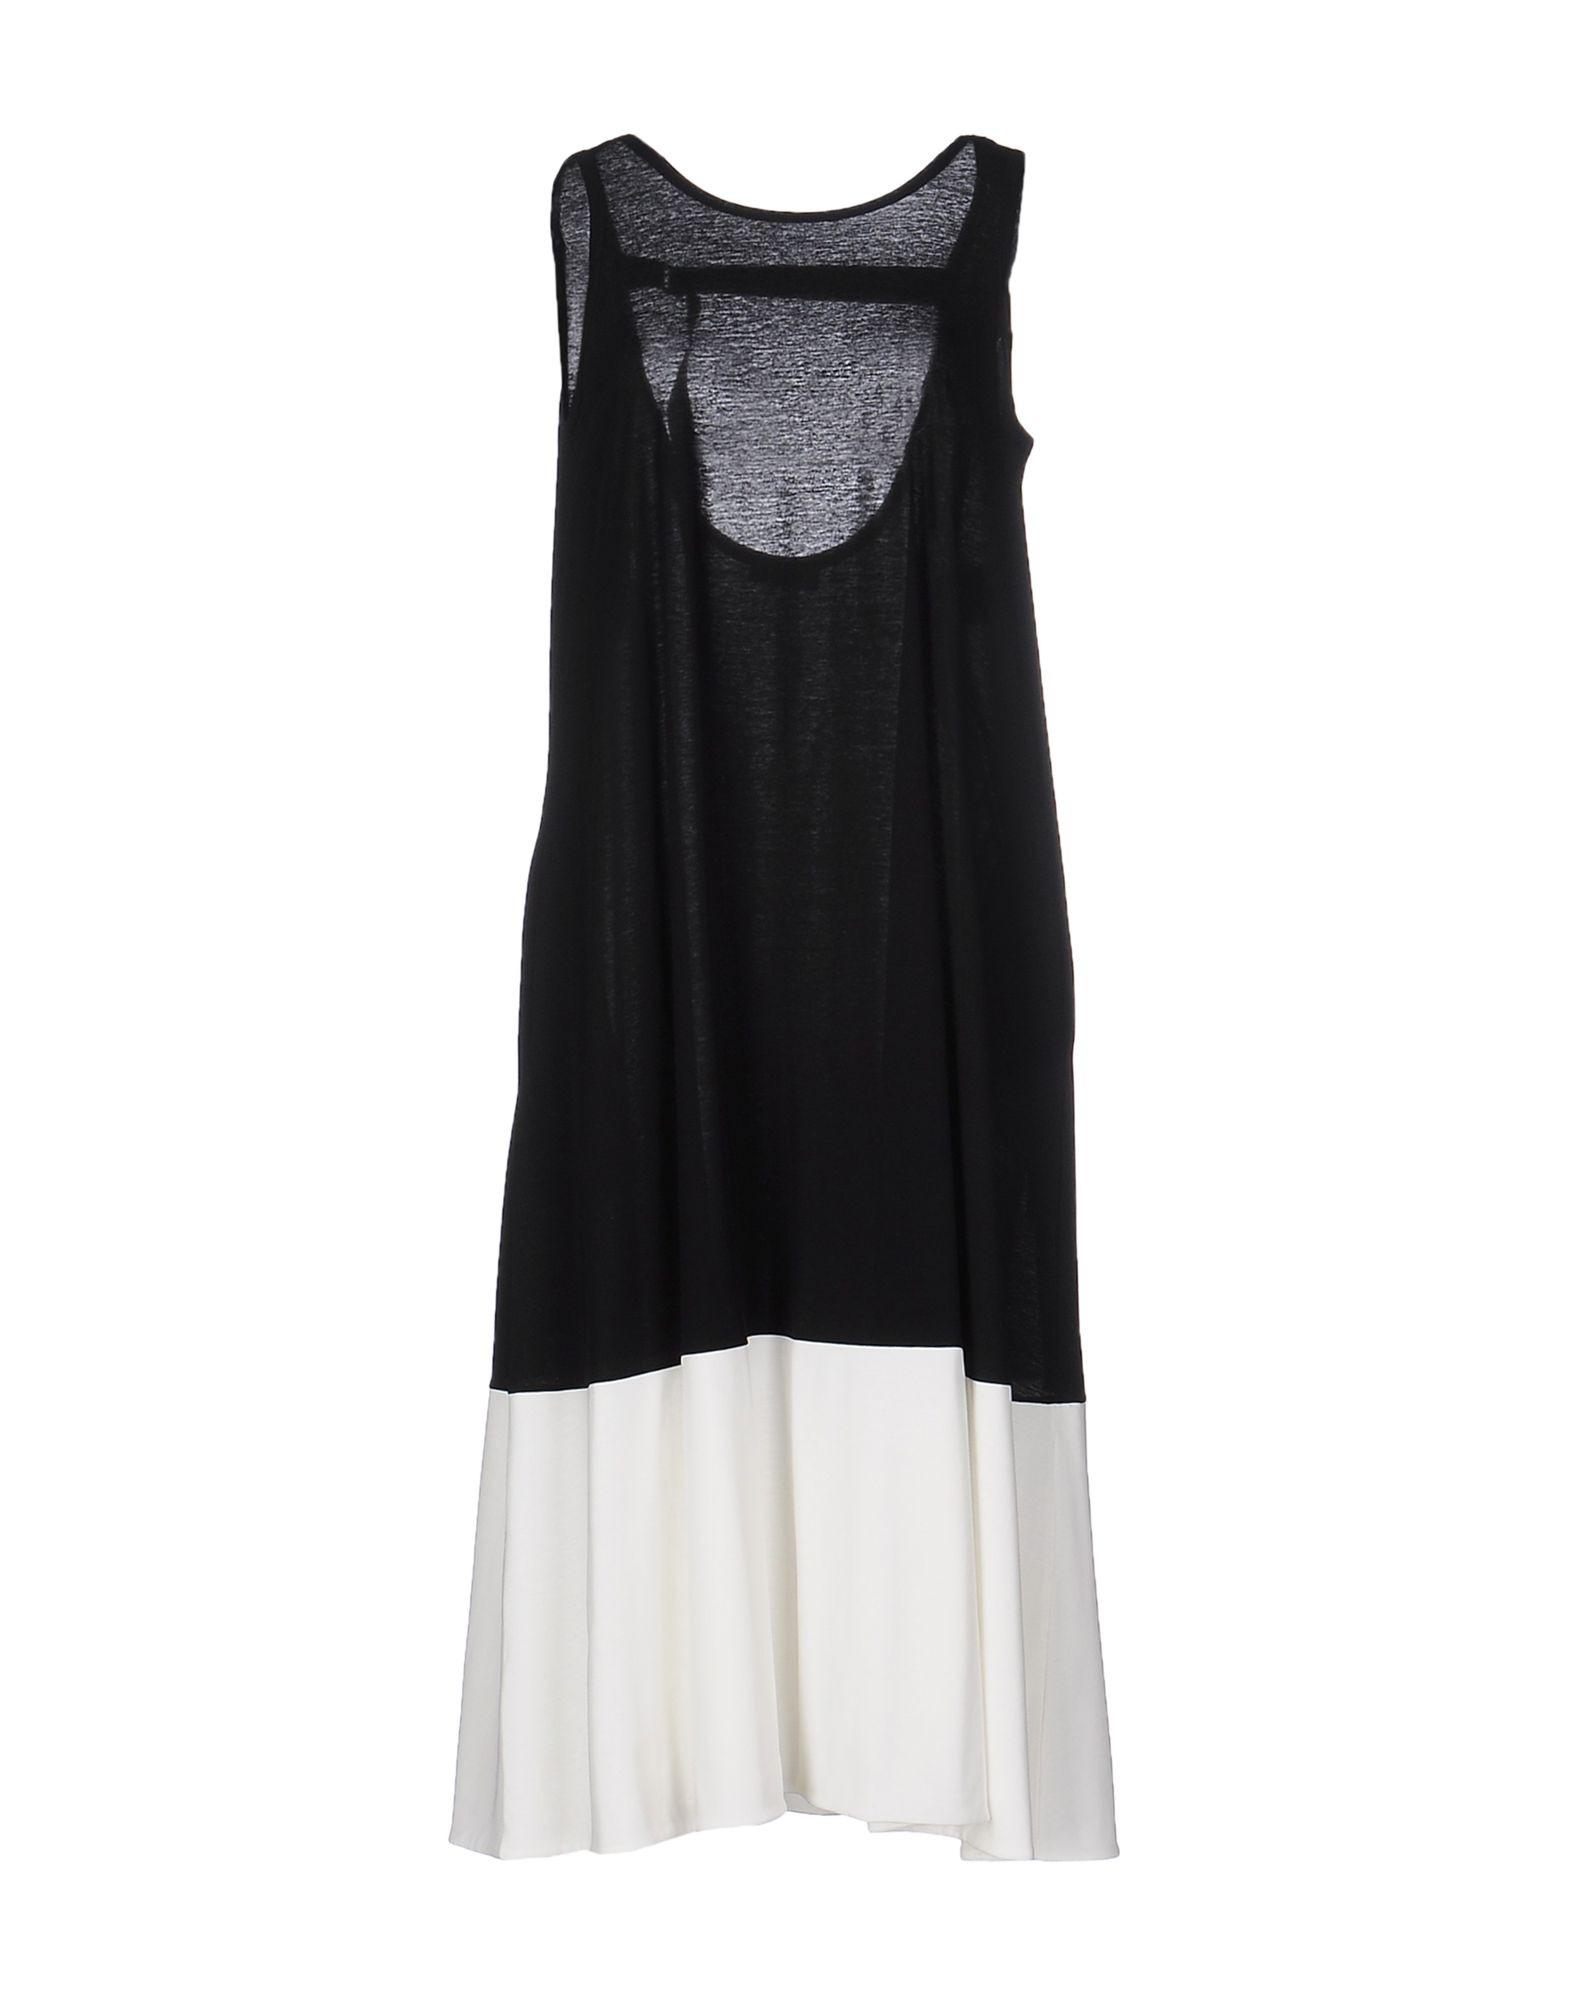 10 Genial Kleid Schwarz Baumwolle Bester PreisFormal Top Kleid Schwarz Baumwolle Spezialgebiet